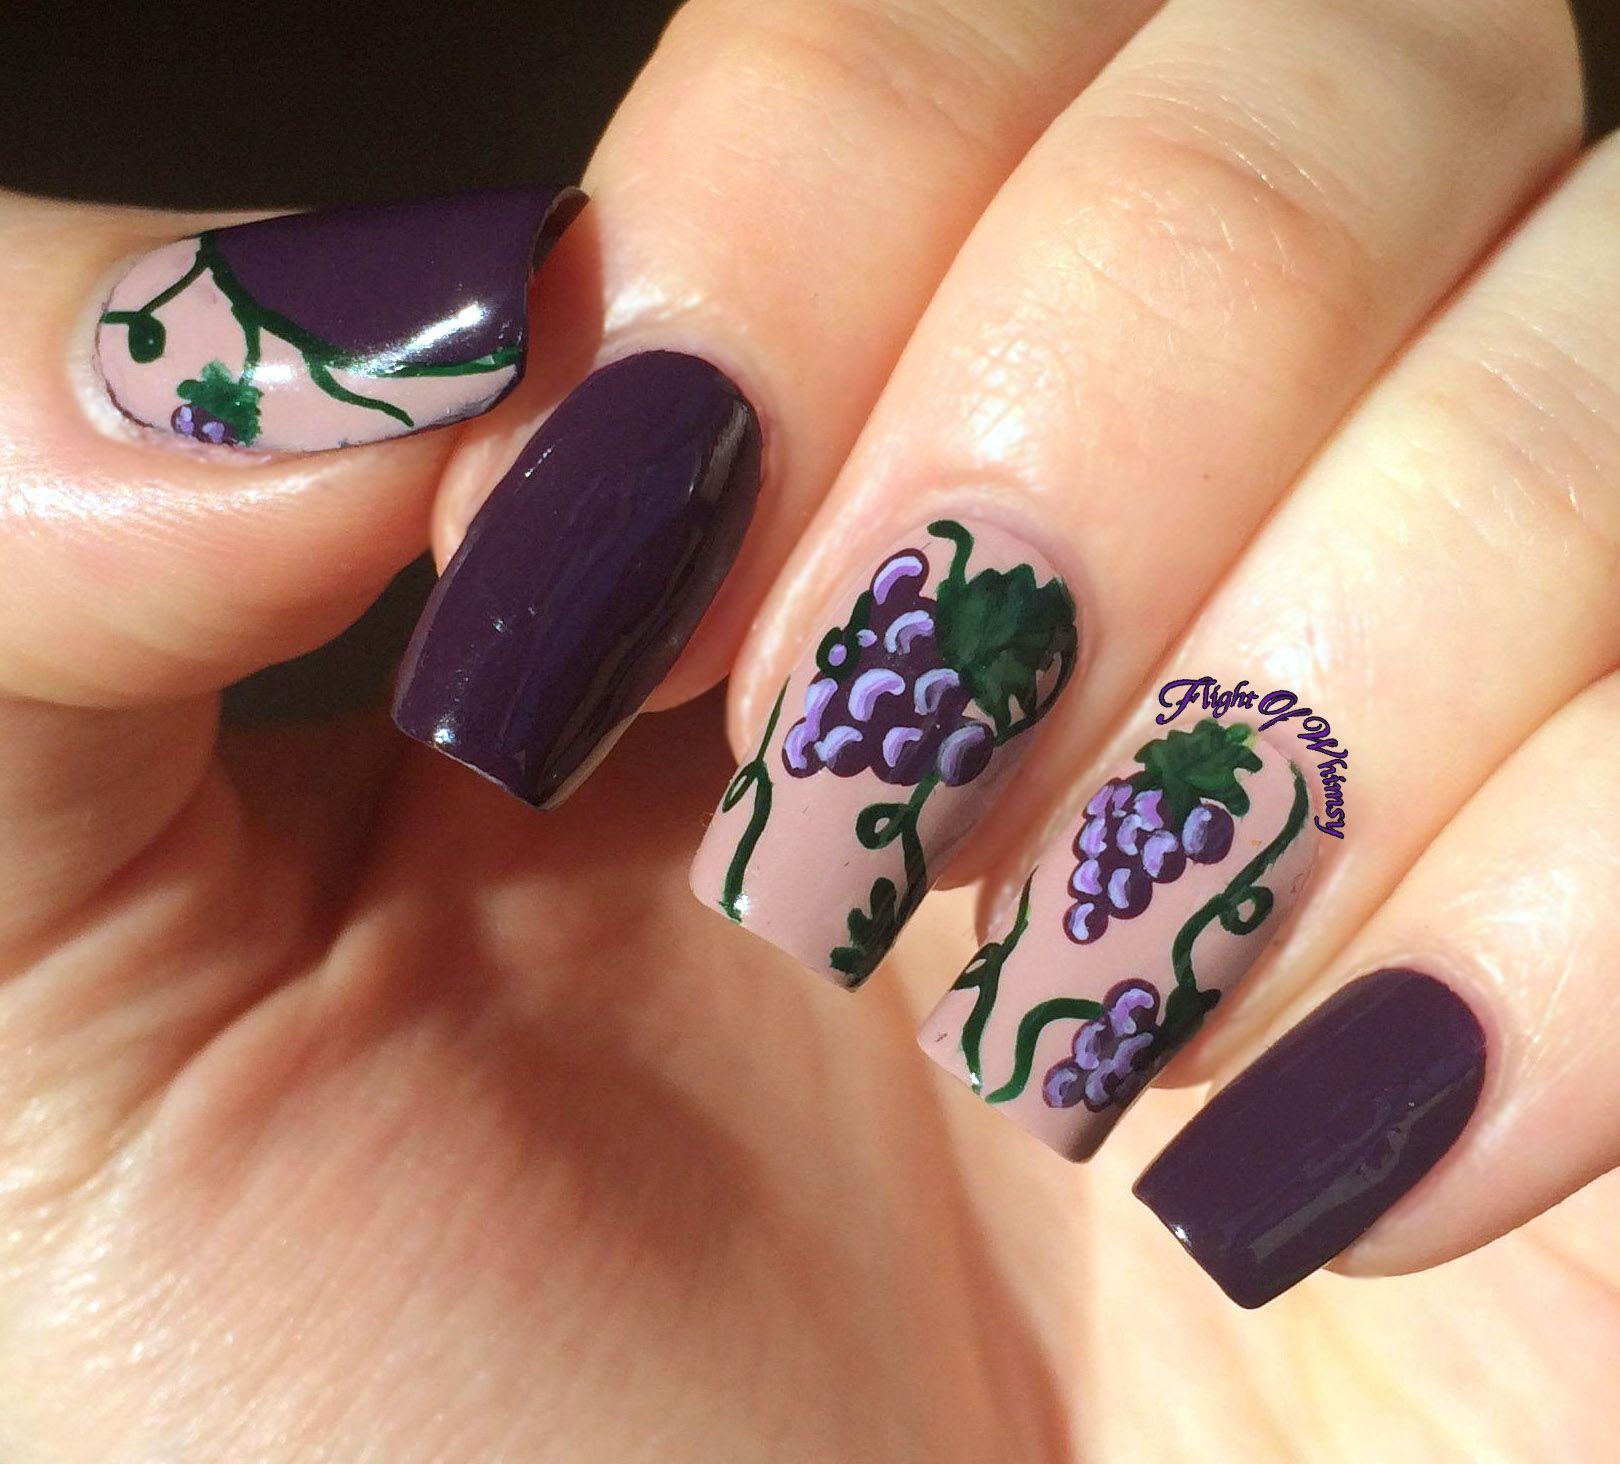 Wunderbar Nailart Bilder Beste Wahl Grapes Nail Art